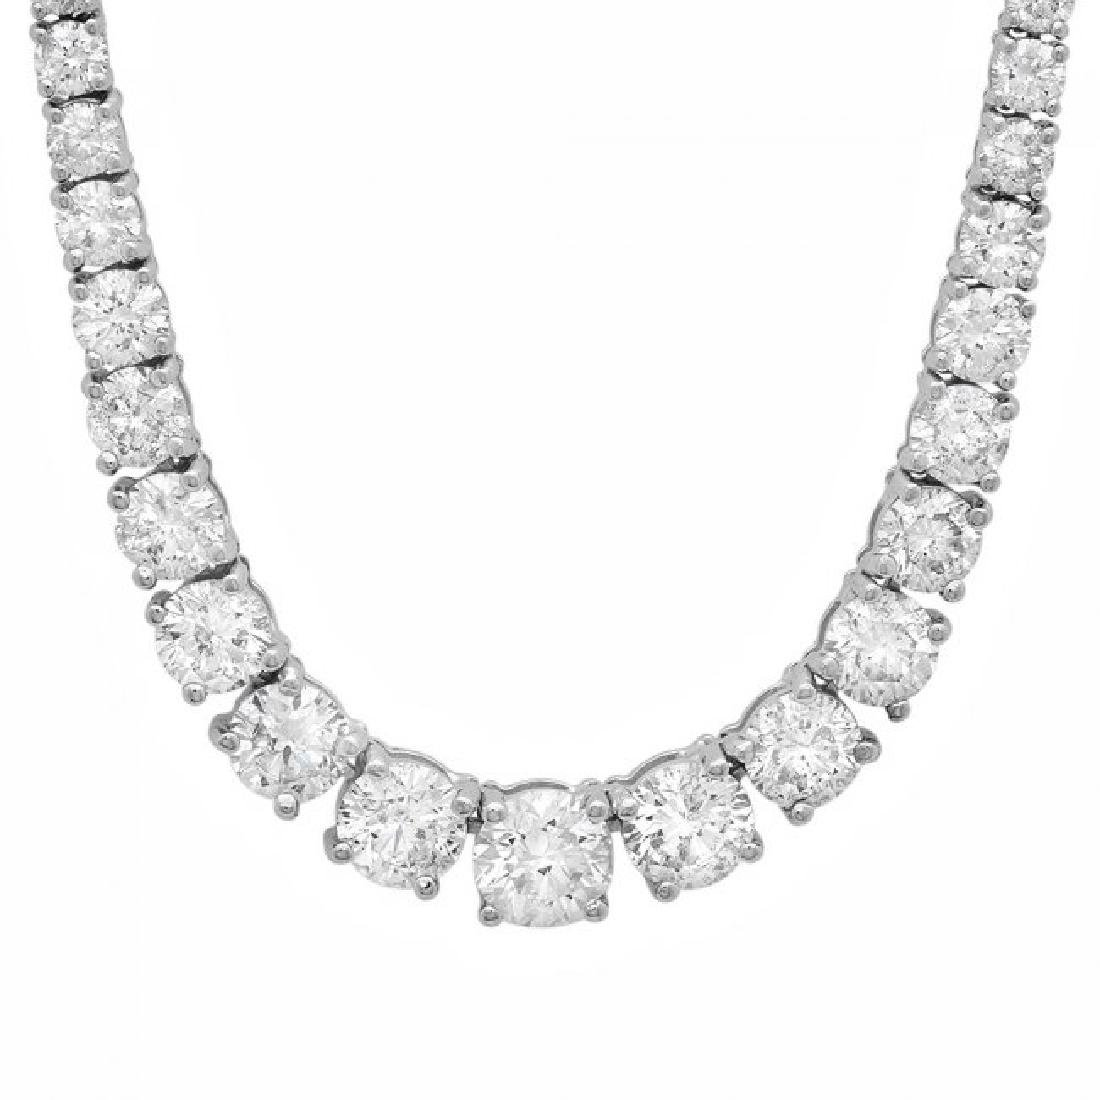 18k White Gold 11.50ct Diamond Necklace - 6